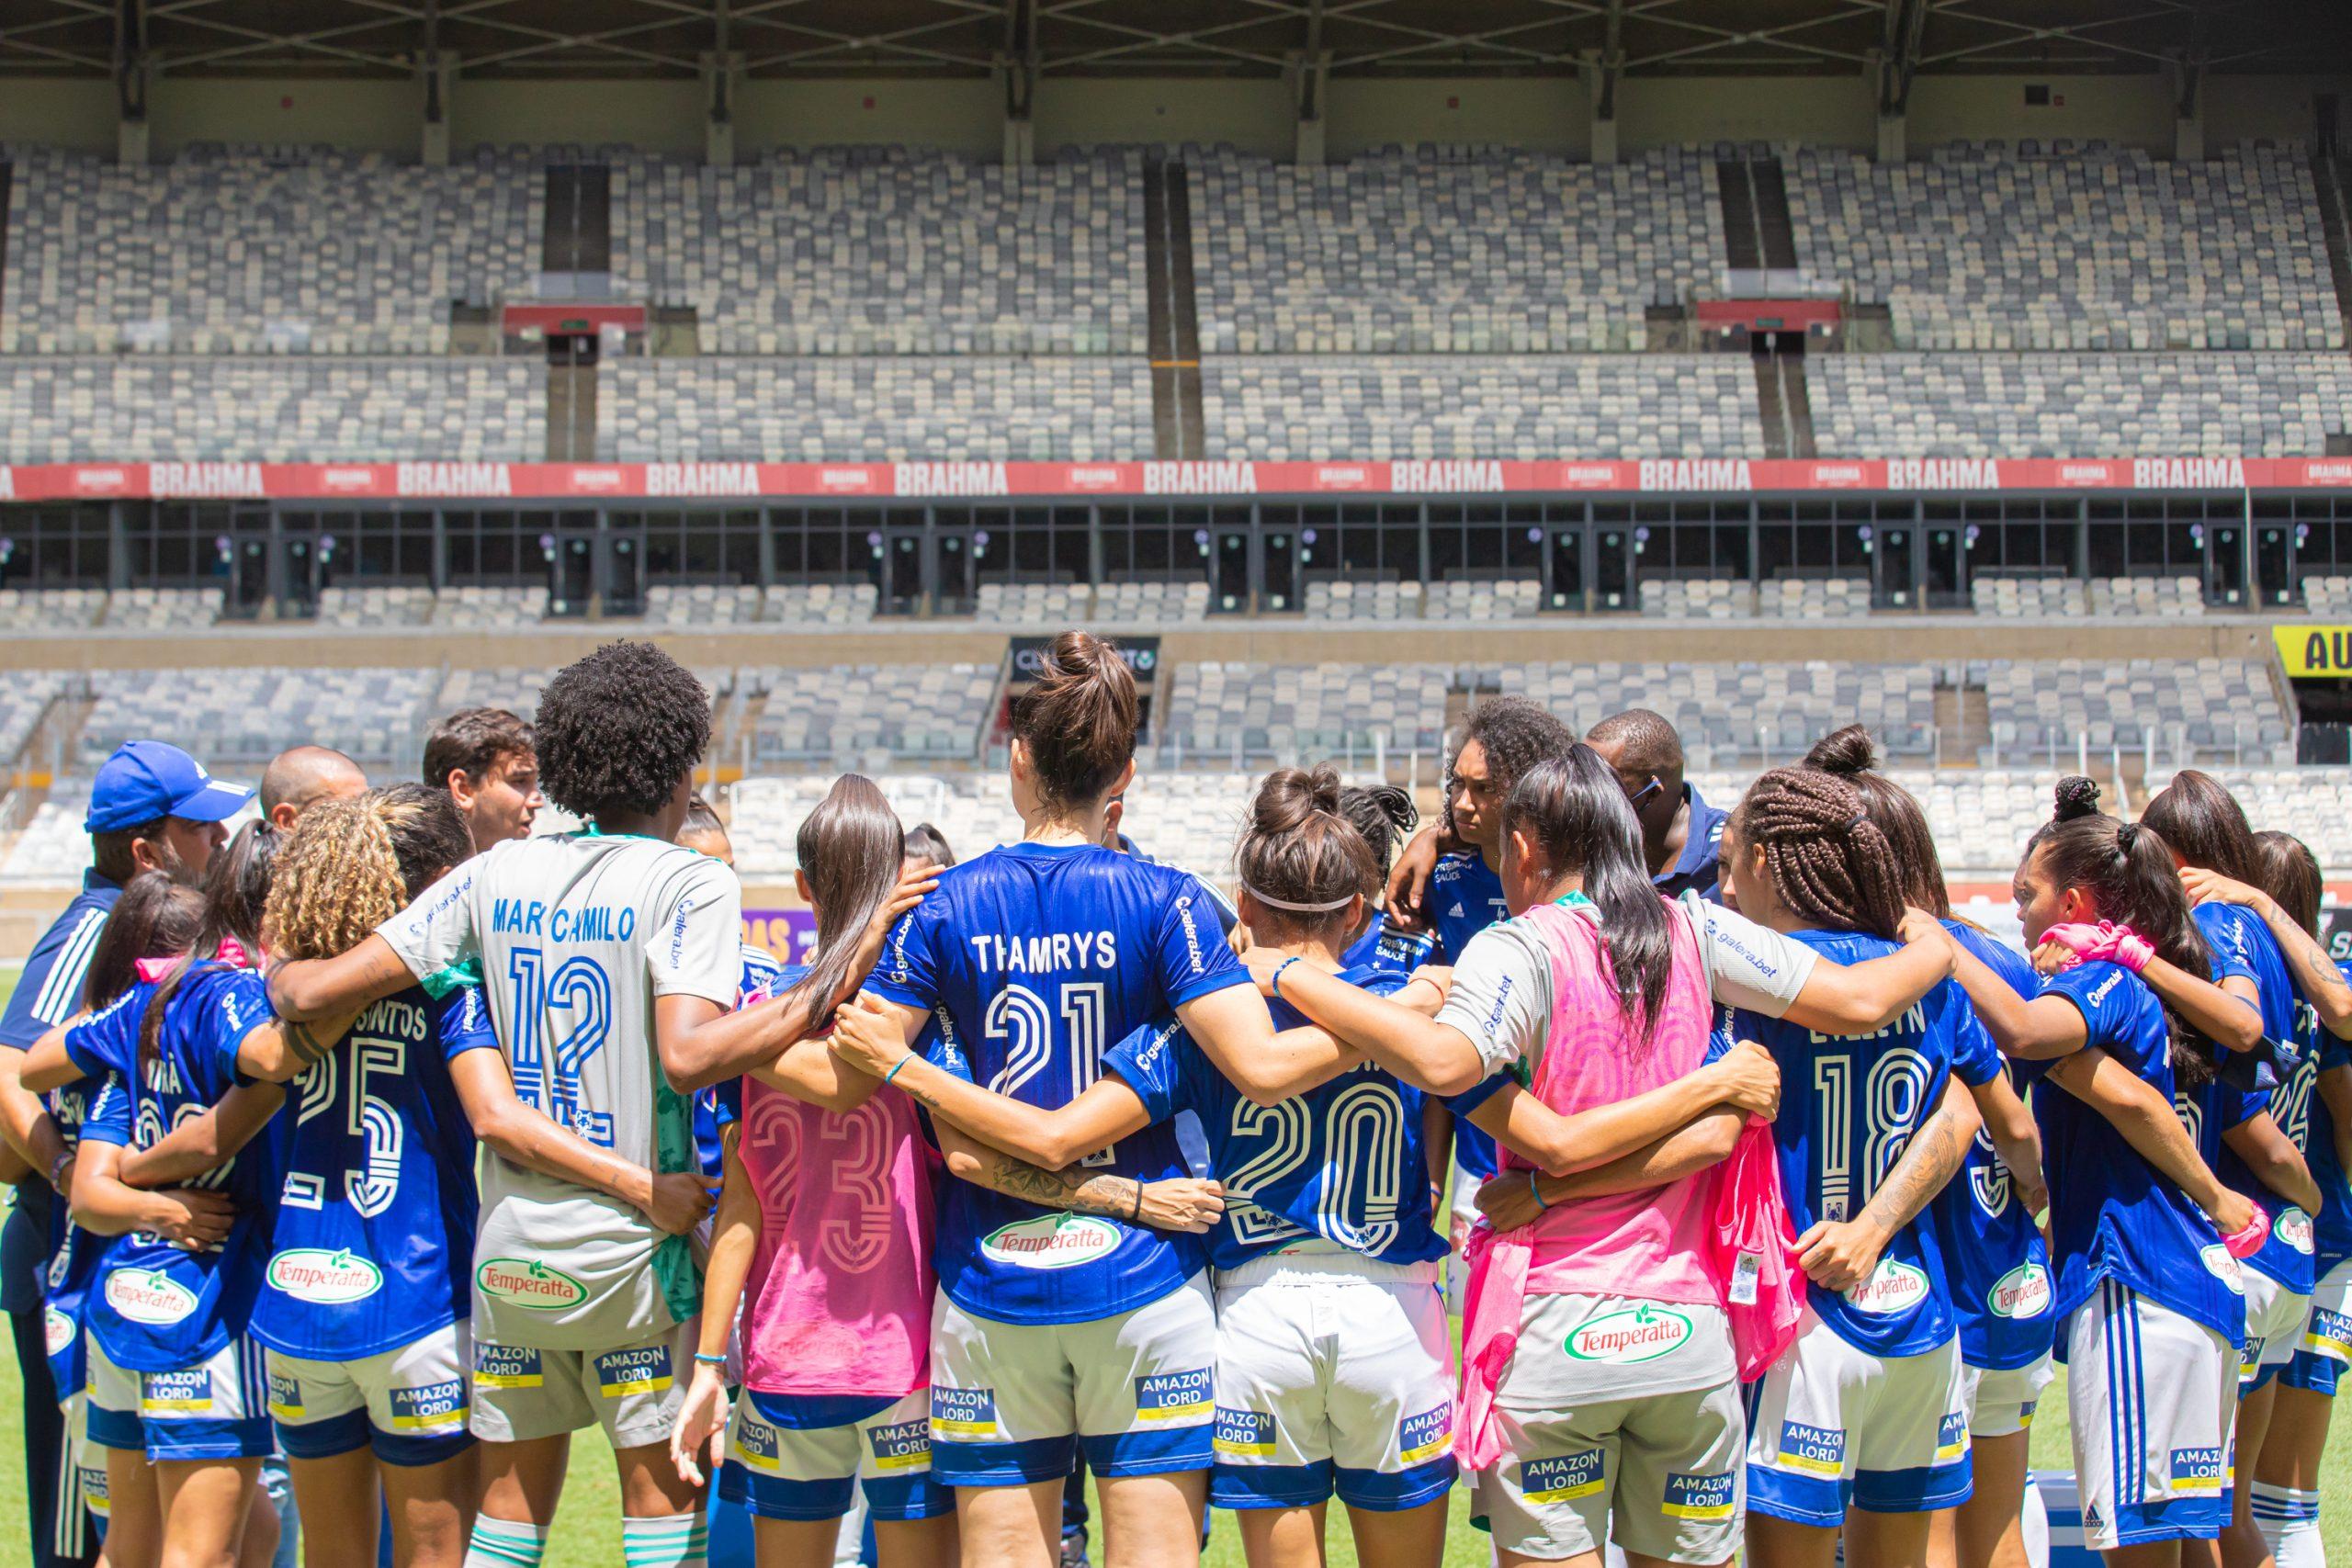 Equipe de futebol feminino celeste